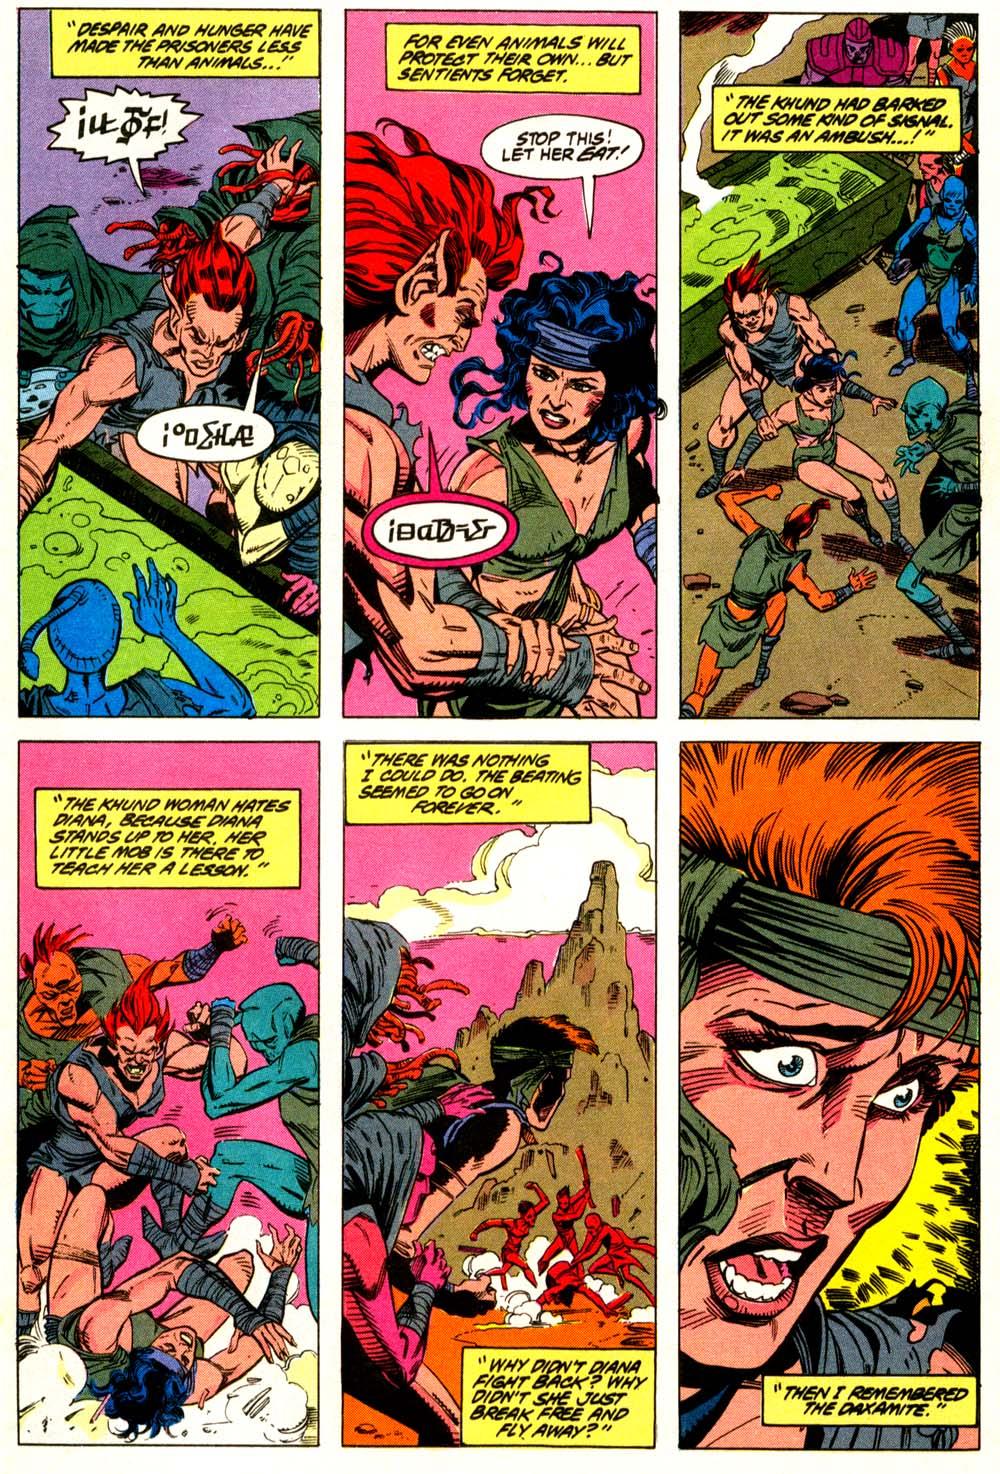 Read online Wonder Woman (1987) comic -  Issue #68 - 8